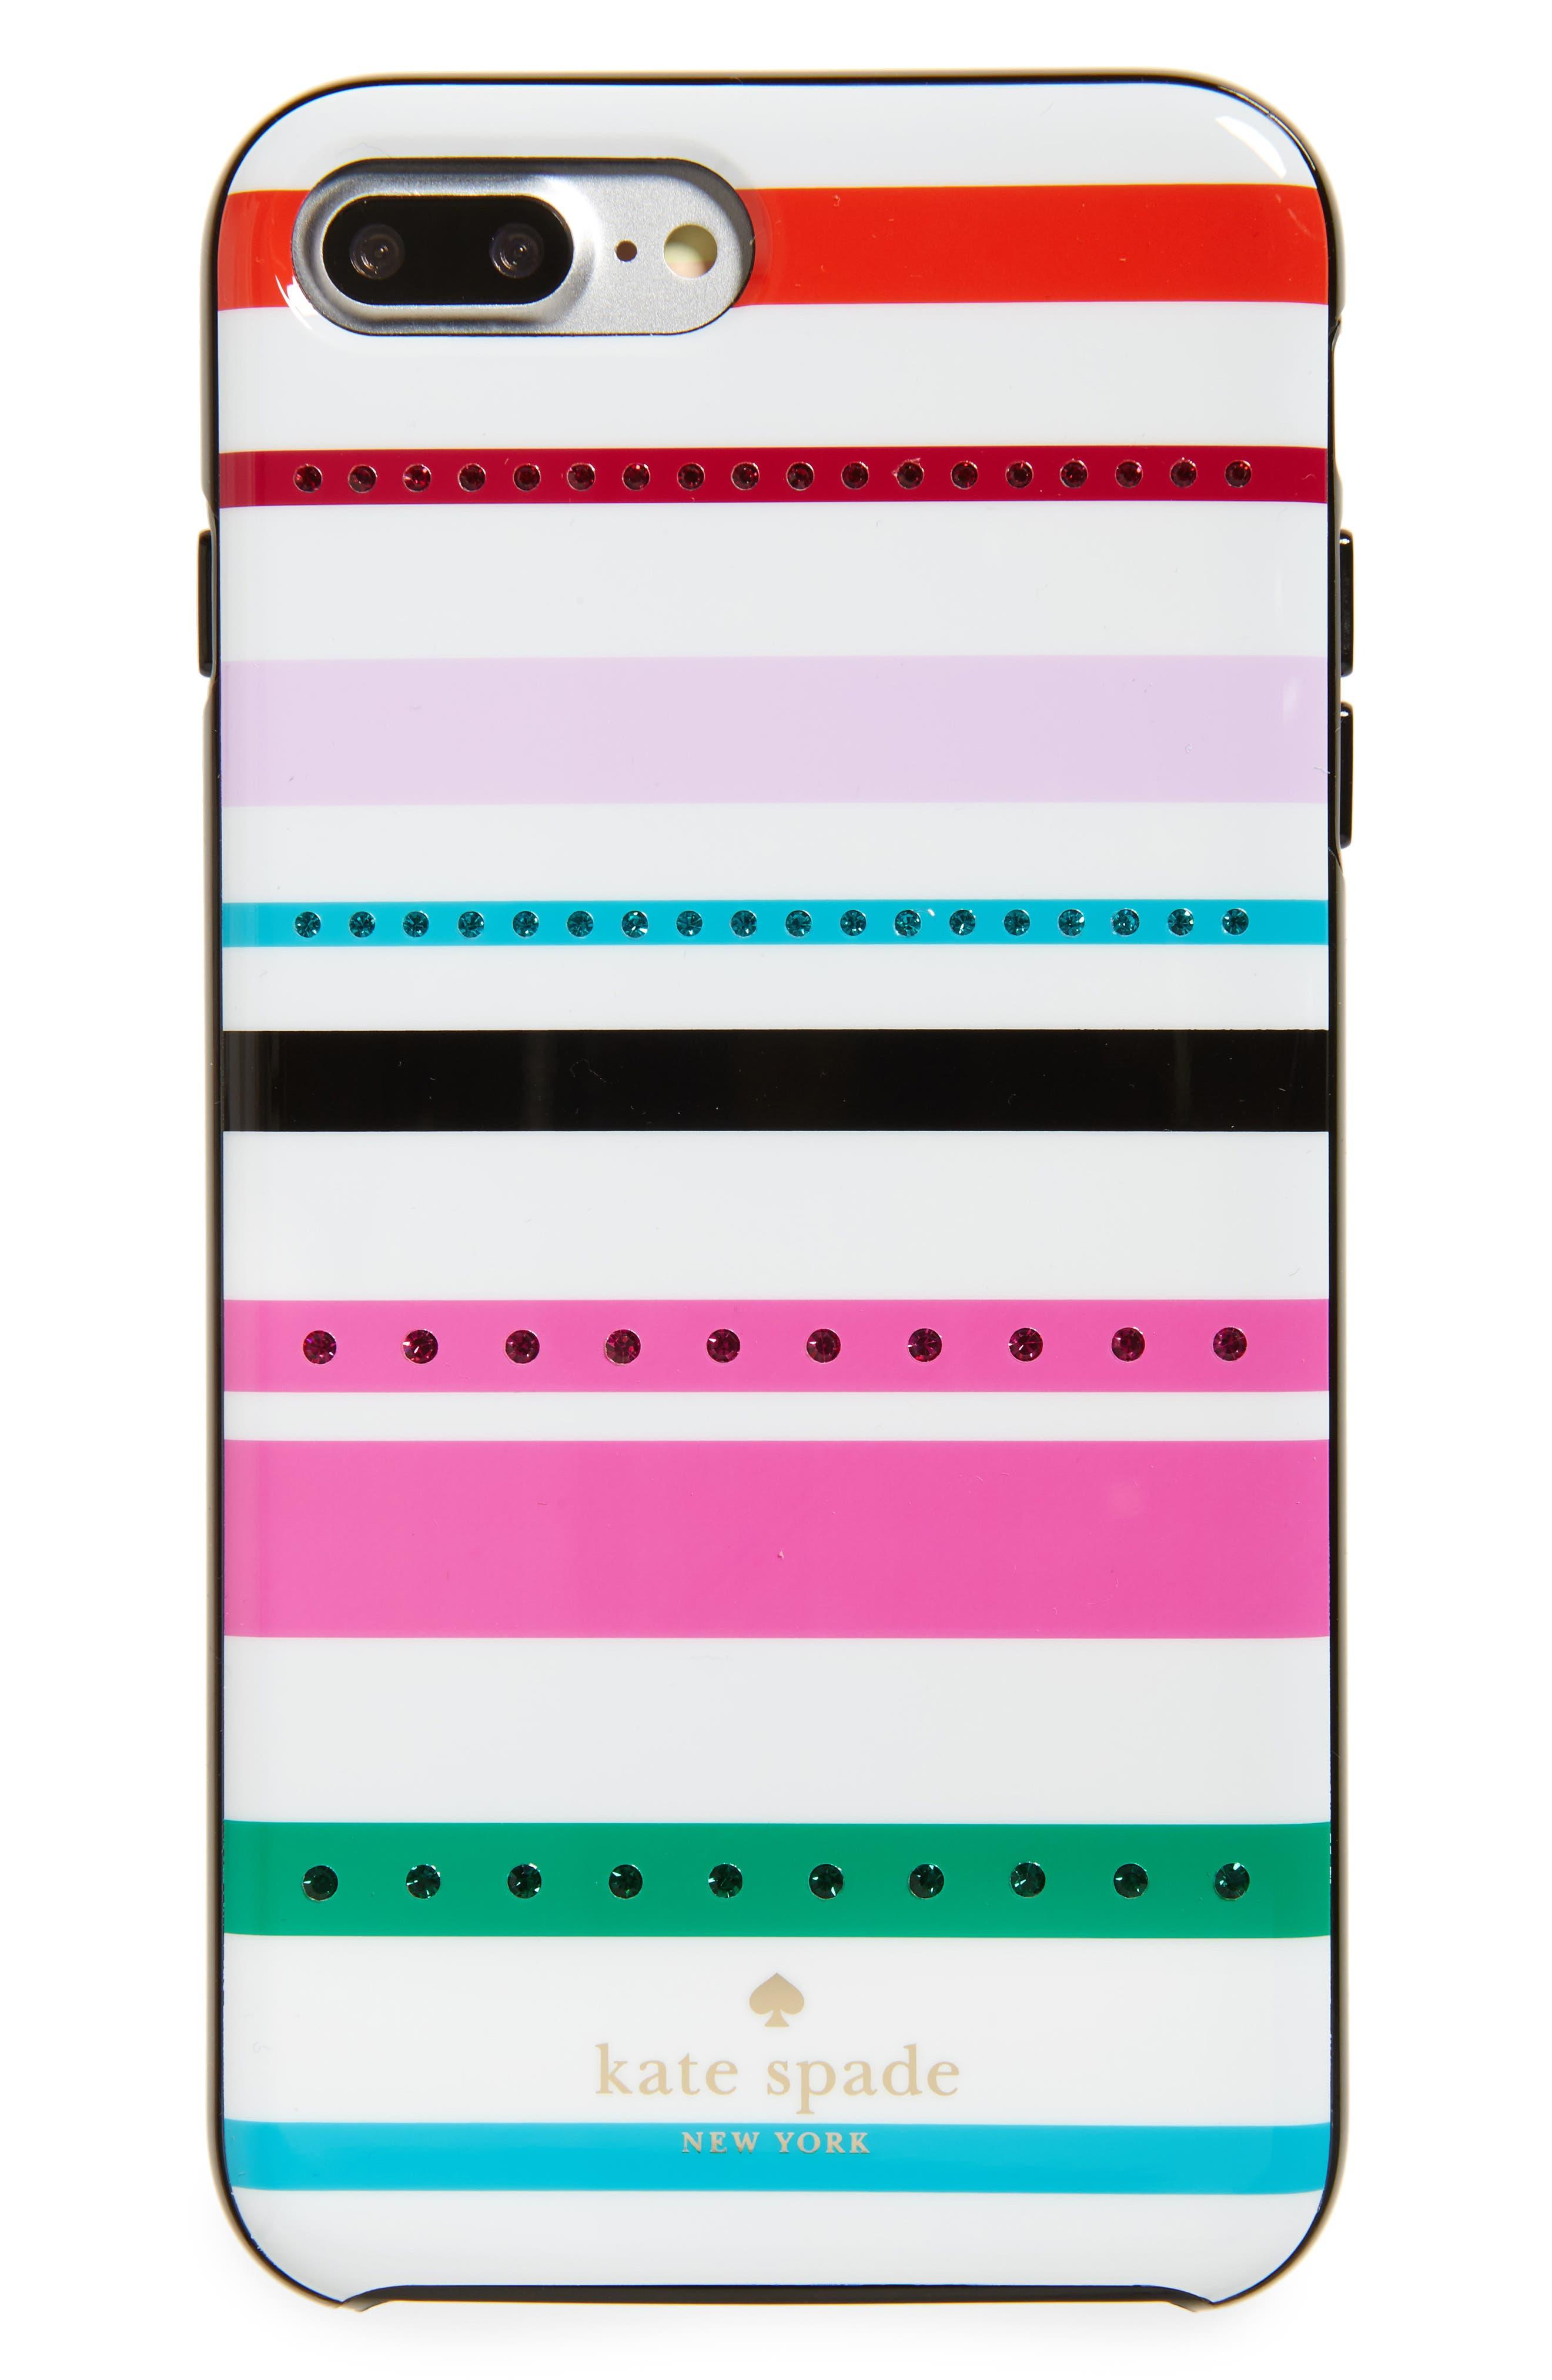 KATE SPADE NEW YORK jeweled fiesta stripe iPhone 7 & 7 Plus case